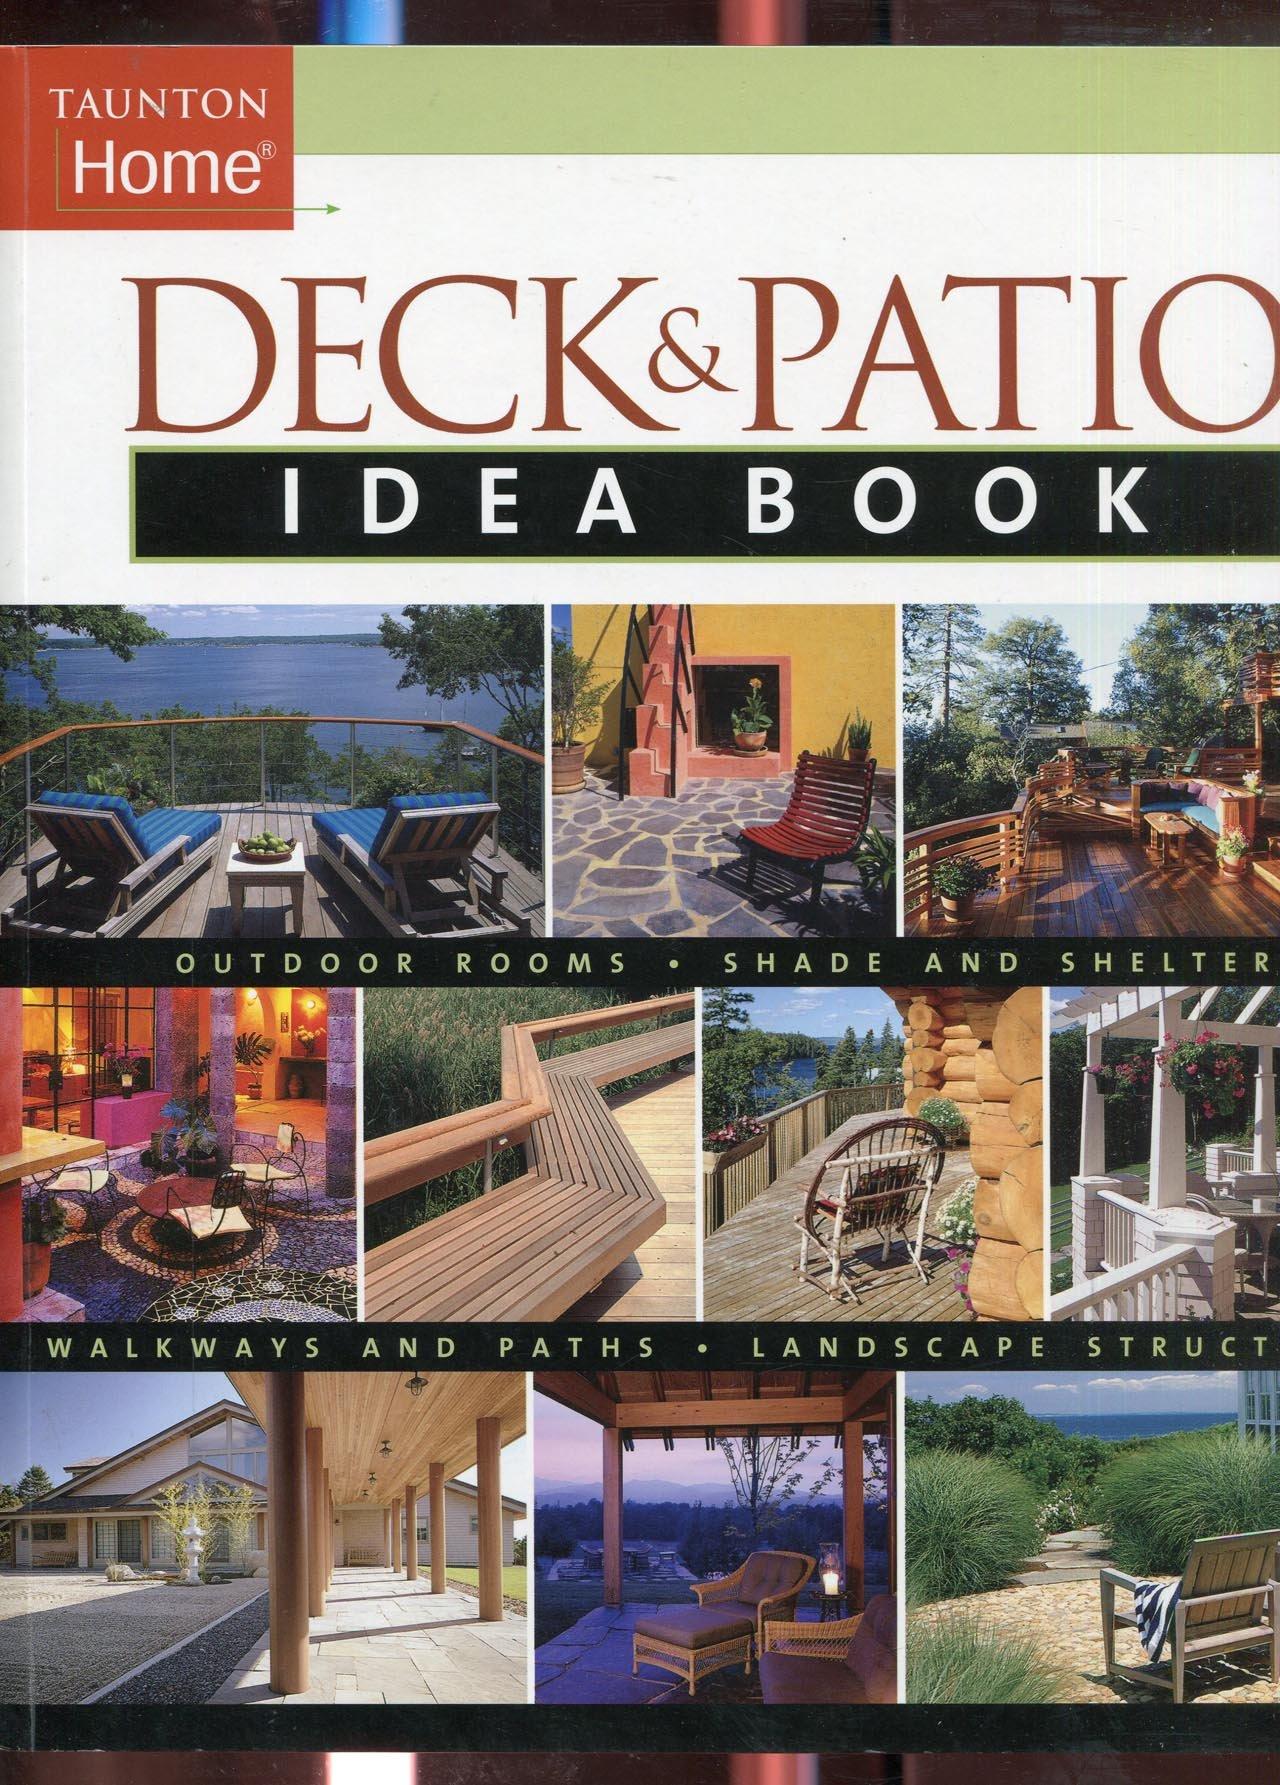 Deck U0026 Patio Idea Book: Outdoor Roomsu2022Shade And Shelteru2022Walkways And Pat  (Taunton Home Idea Books): Julie Stillman, Jane Gitlin: 9781561586394:  Amazon.com: ...